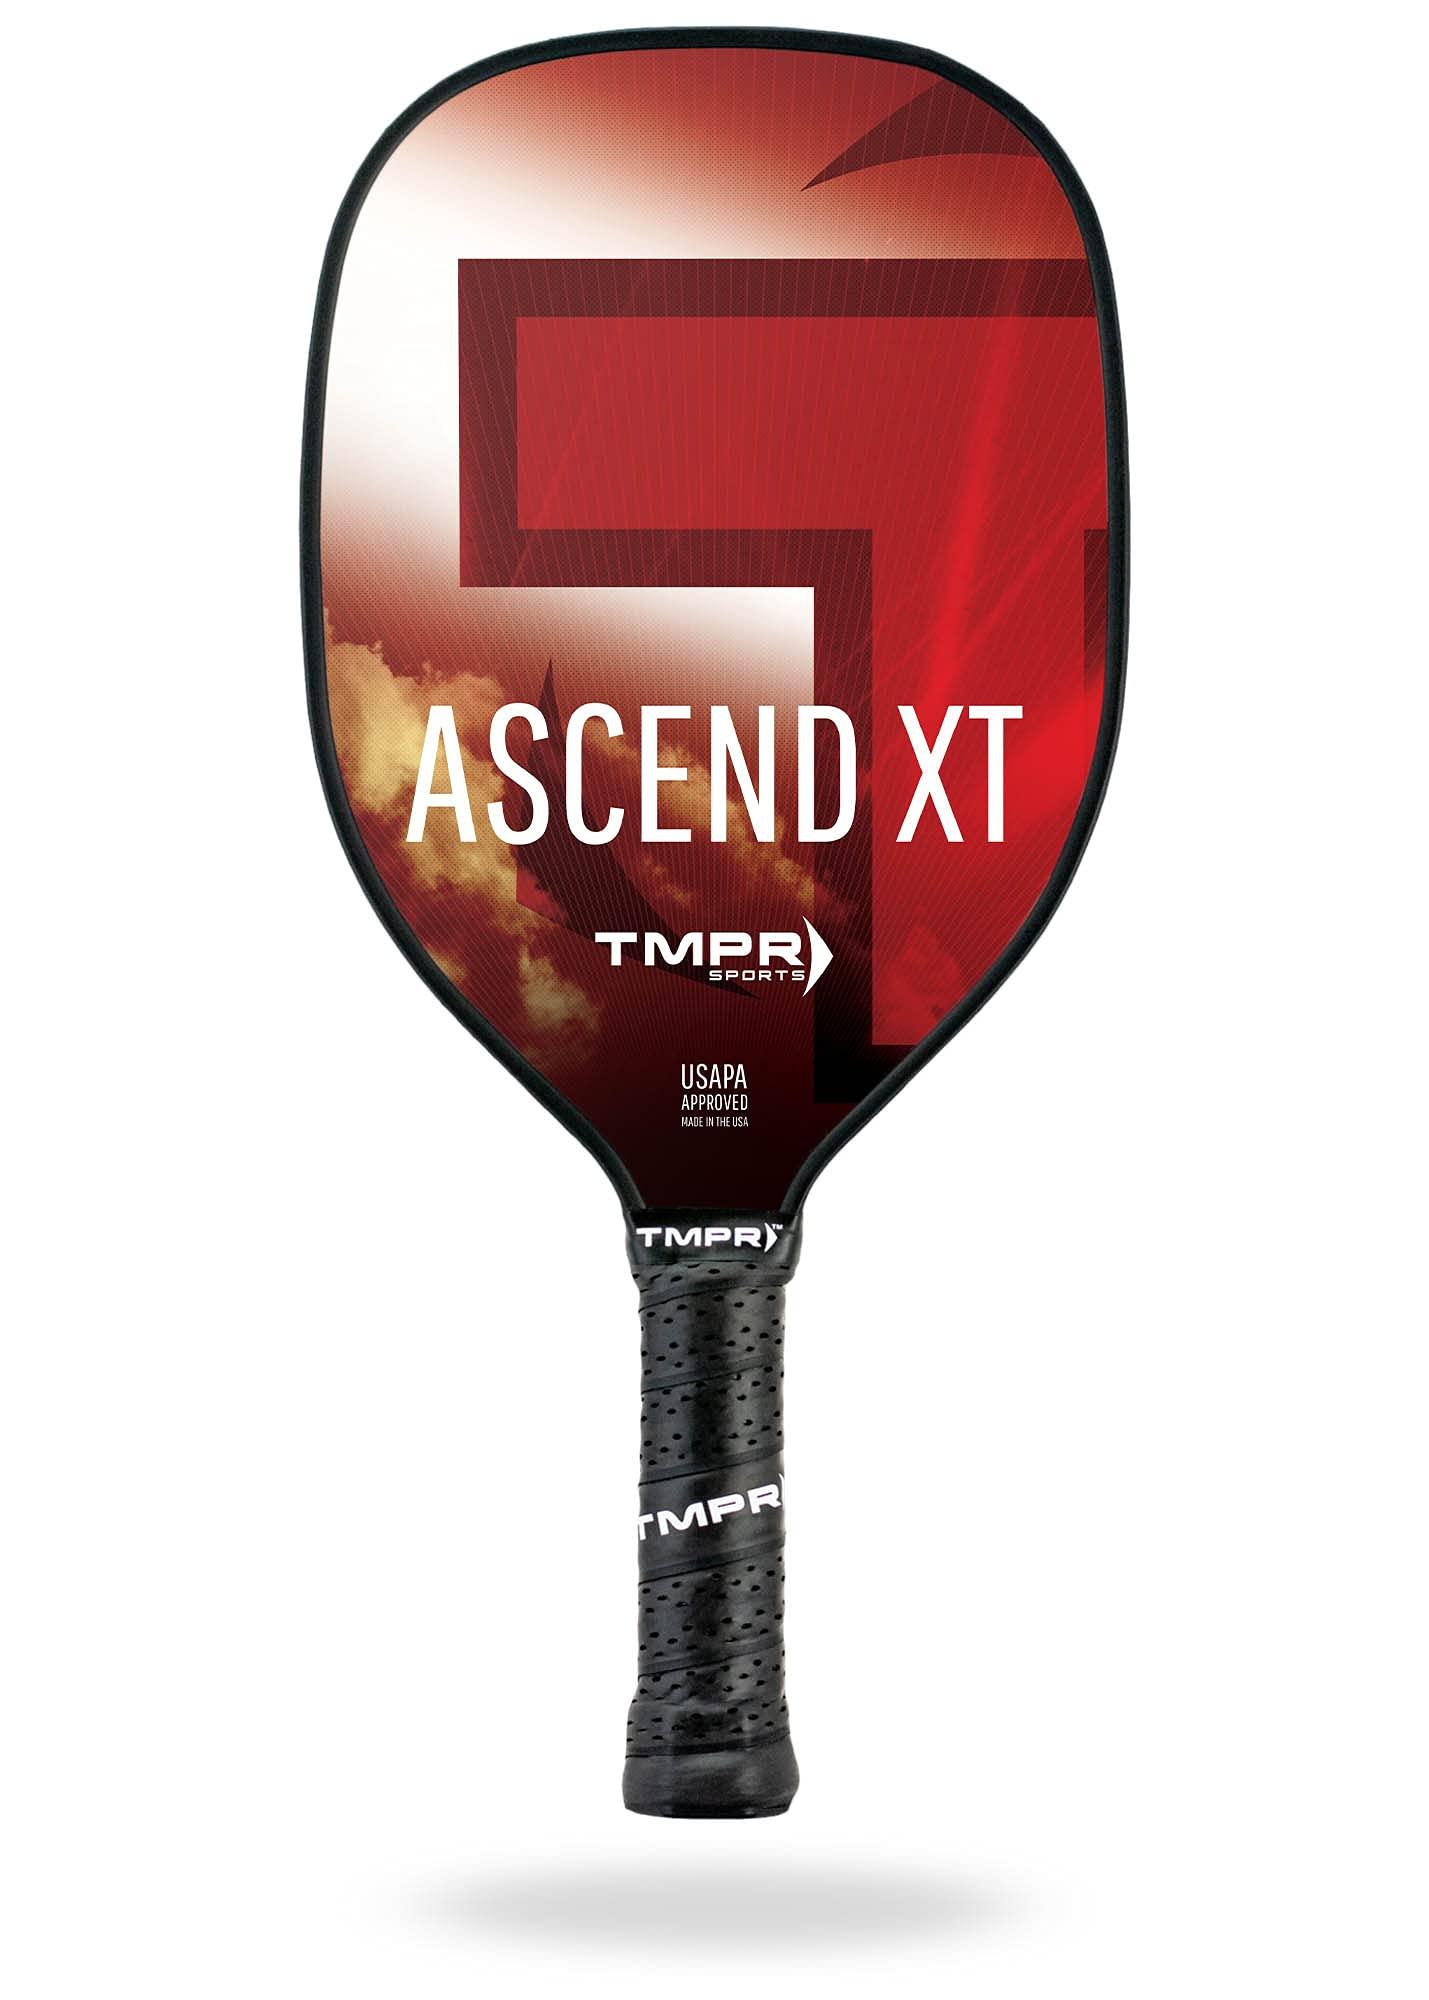 TMPR Sports > Ascend > Honeycomb Polymer Pickleball Pa -SJ2H